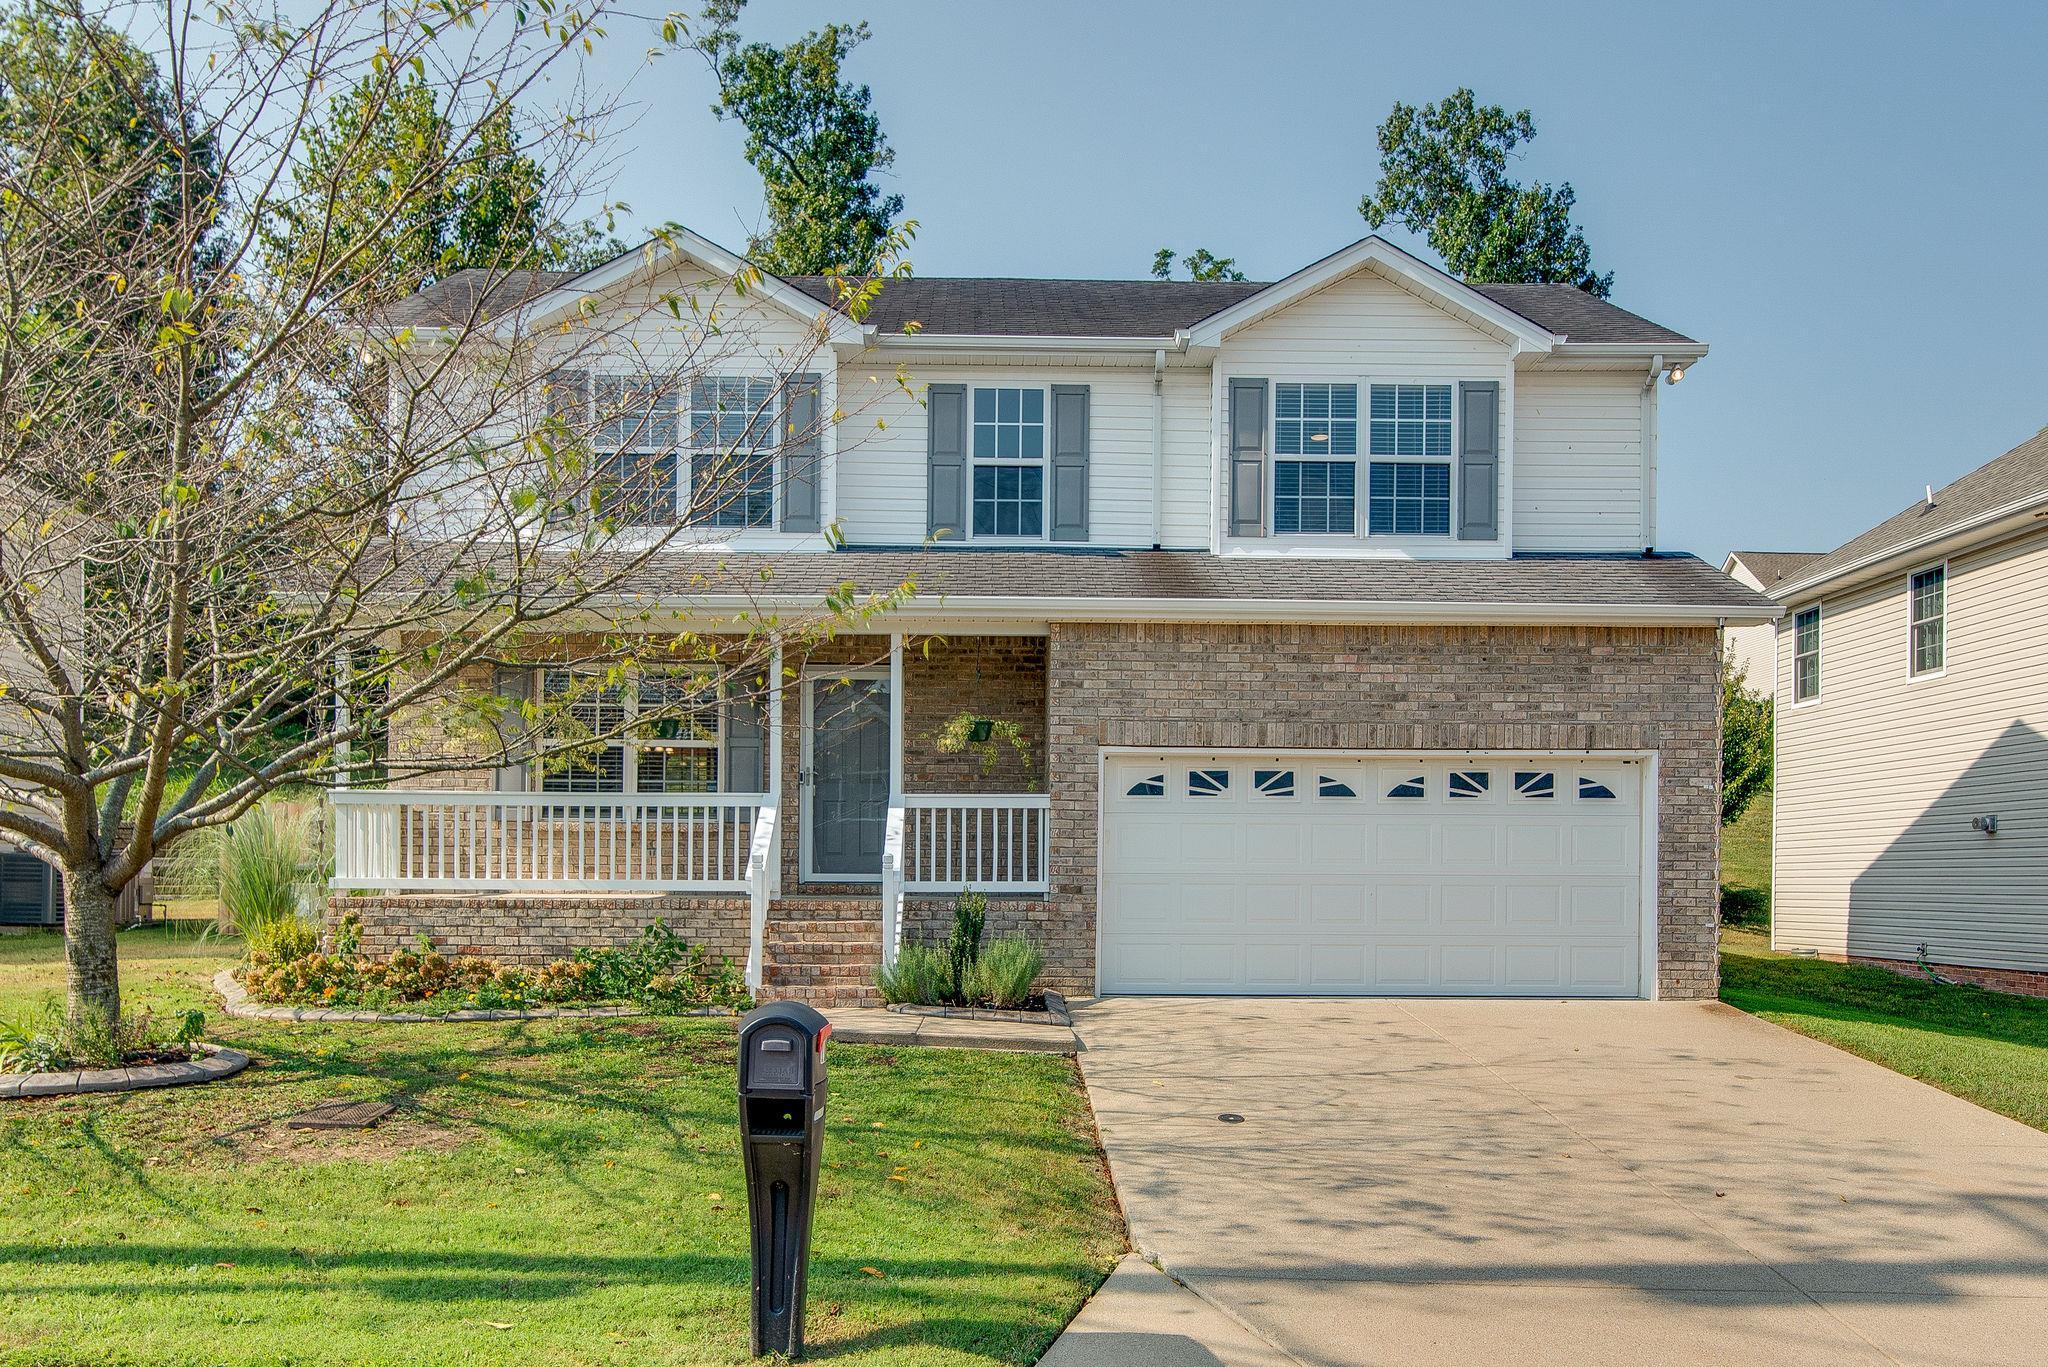 1157 Blairfield Dr, Antioch, TN 37013 - Antioch, TN real estate listing